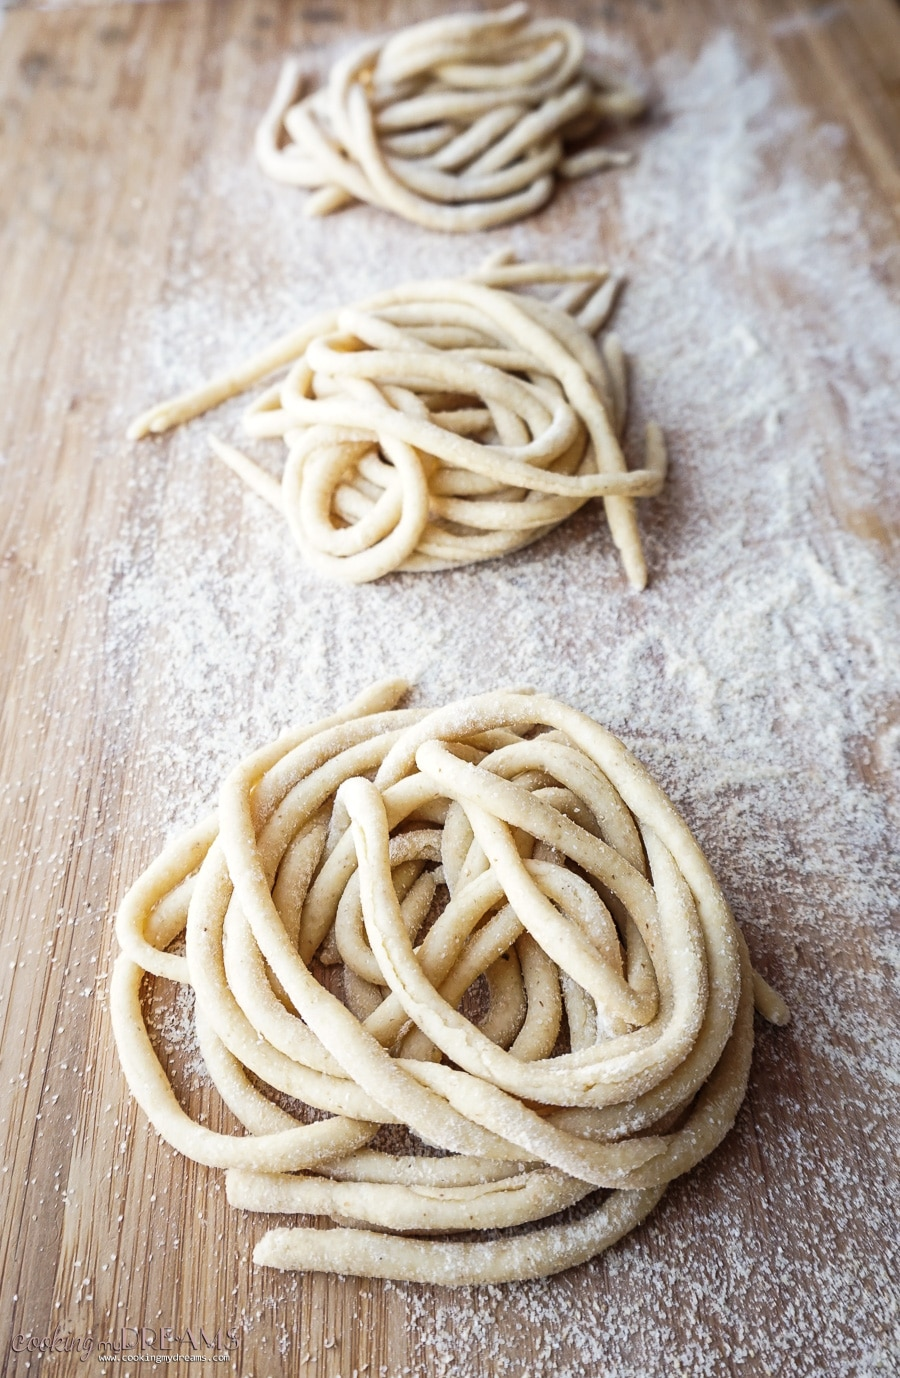 raw handmade pici pasta